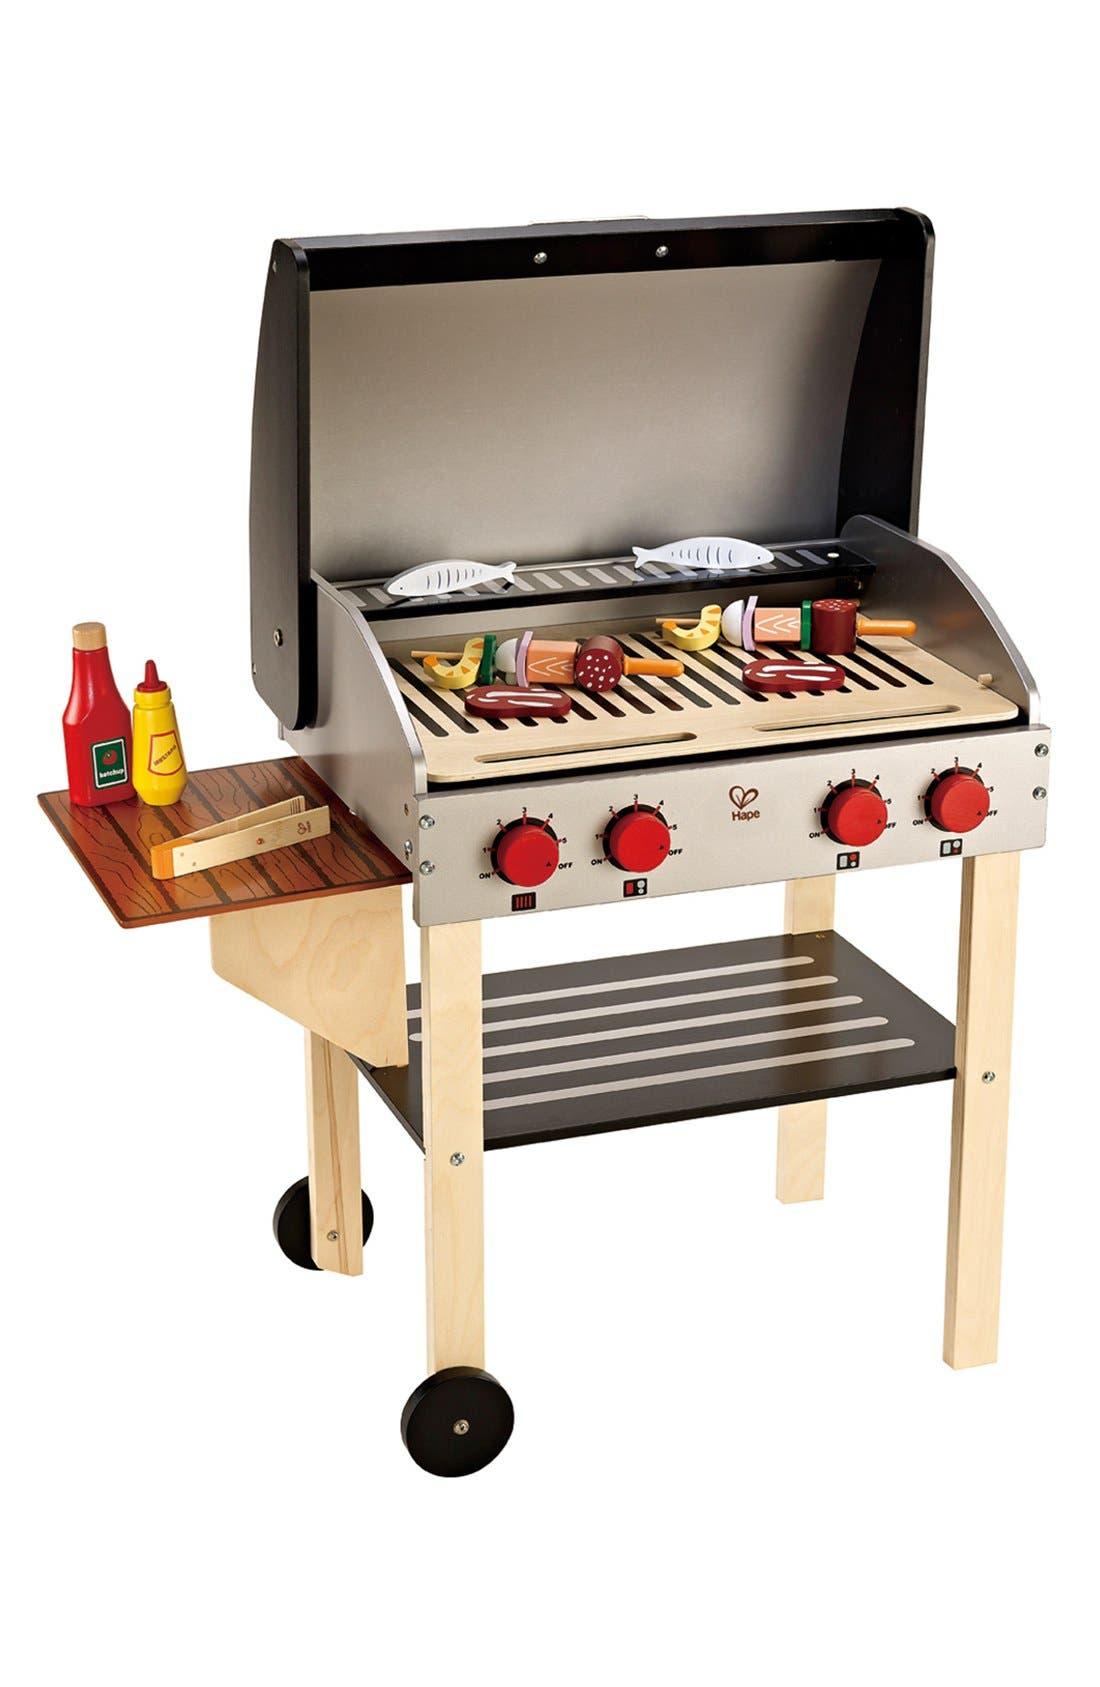 Gourmet Grill & Shish Kabob Play Set,                         Main,                         color, 001